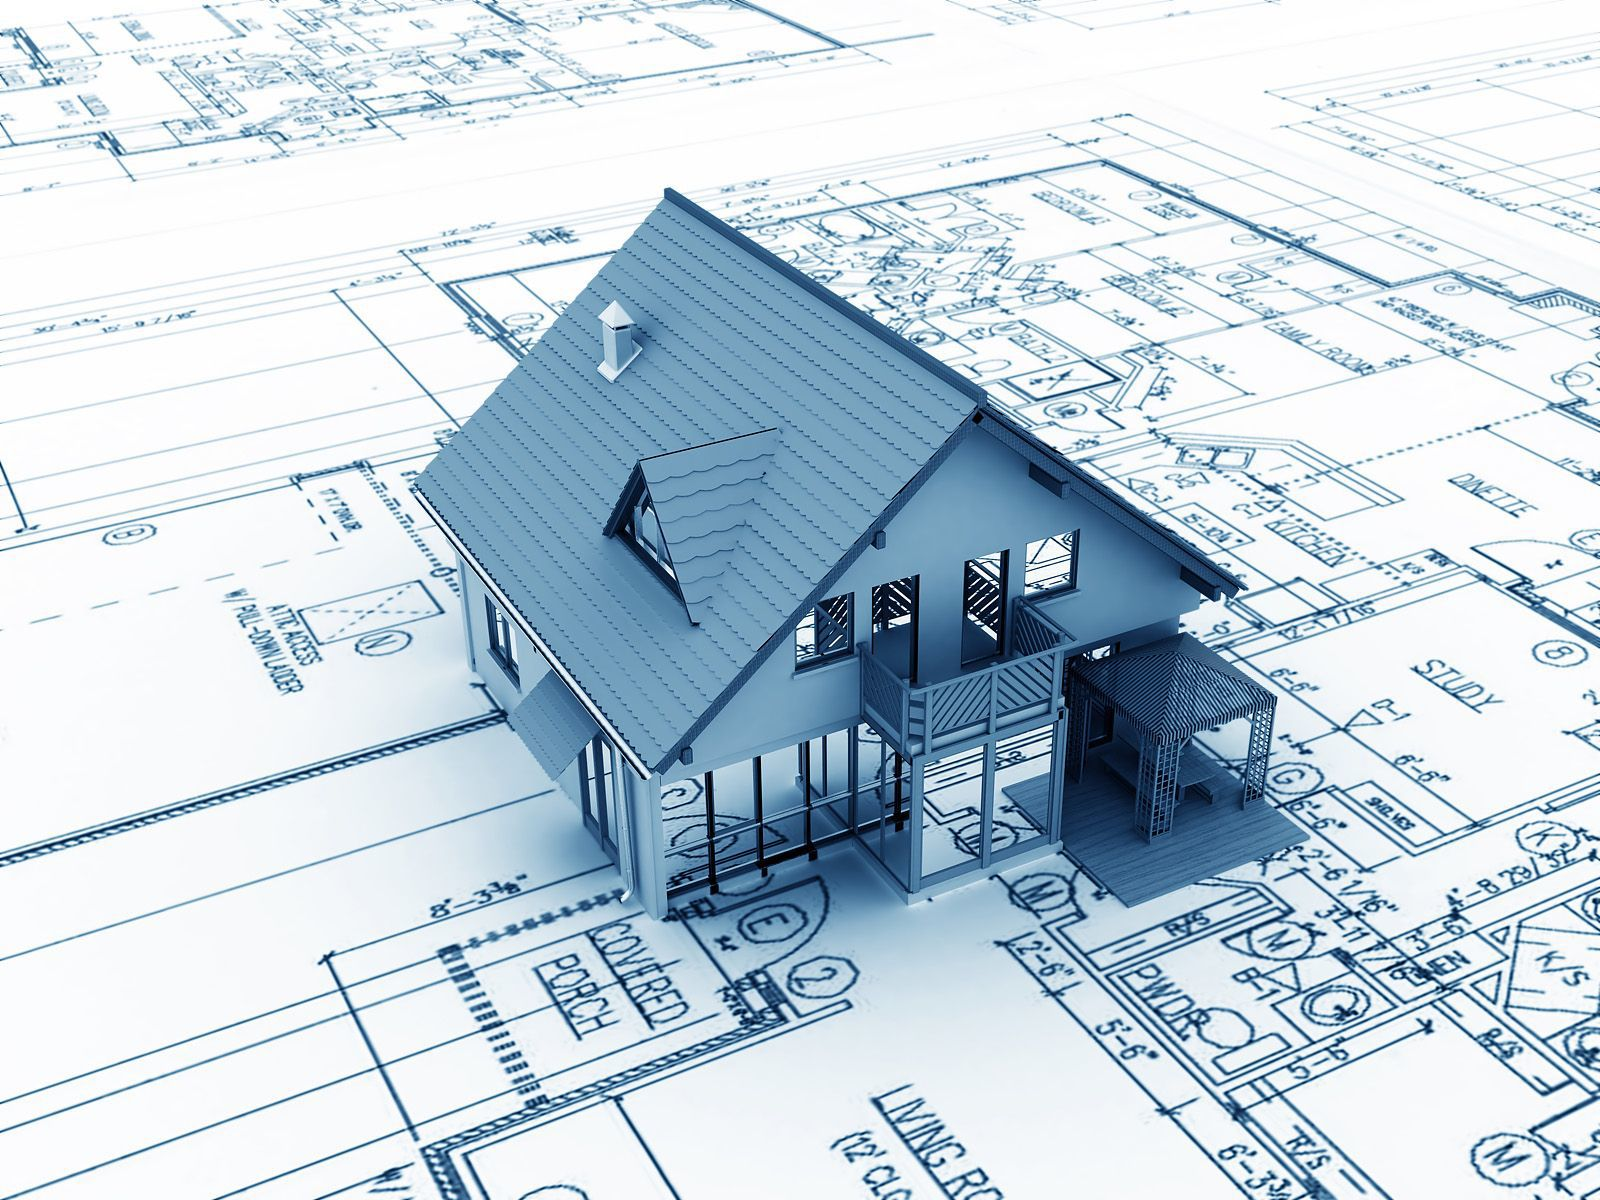 realistic_blueprints-1600x1200.jpg